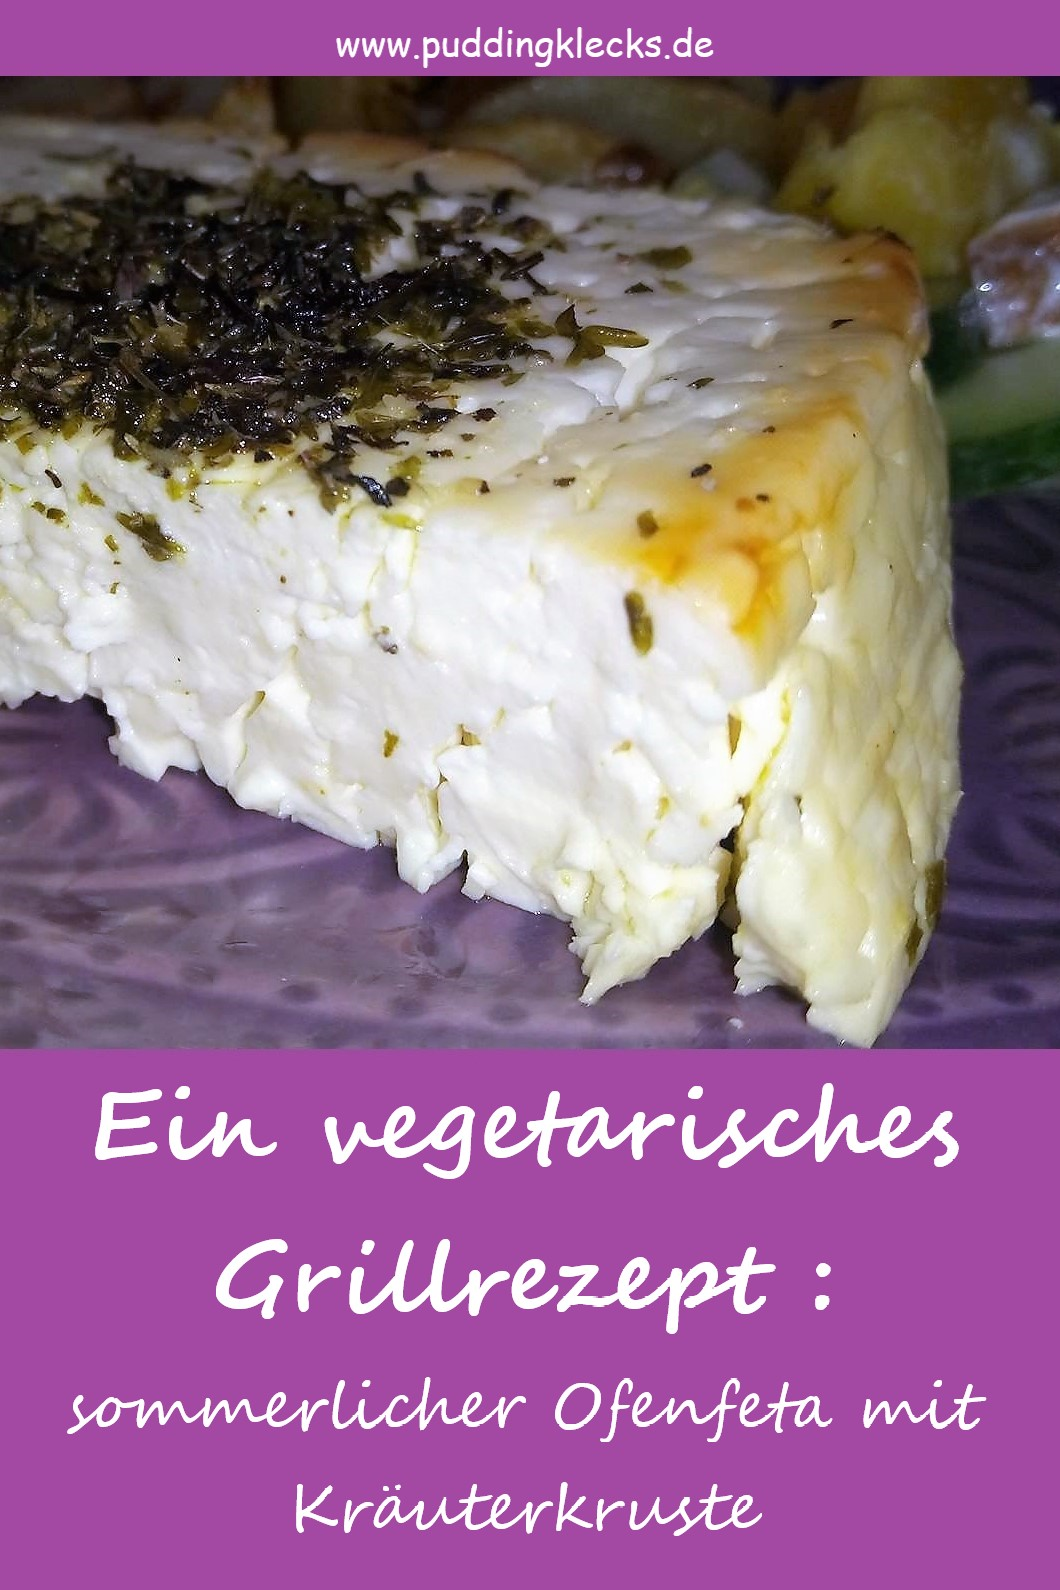 Ofenfeta, Rezept, vegetarisch, Kraeuterkruste